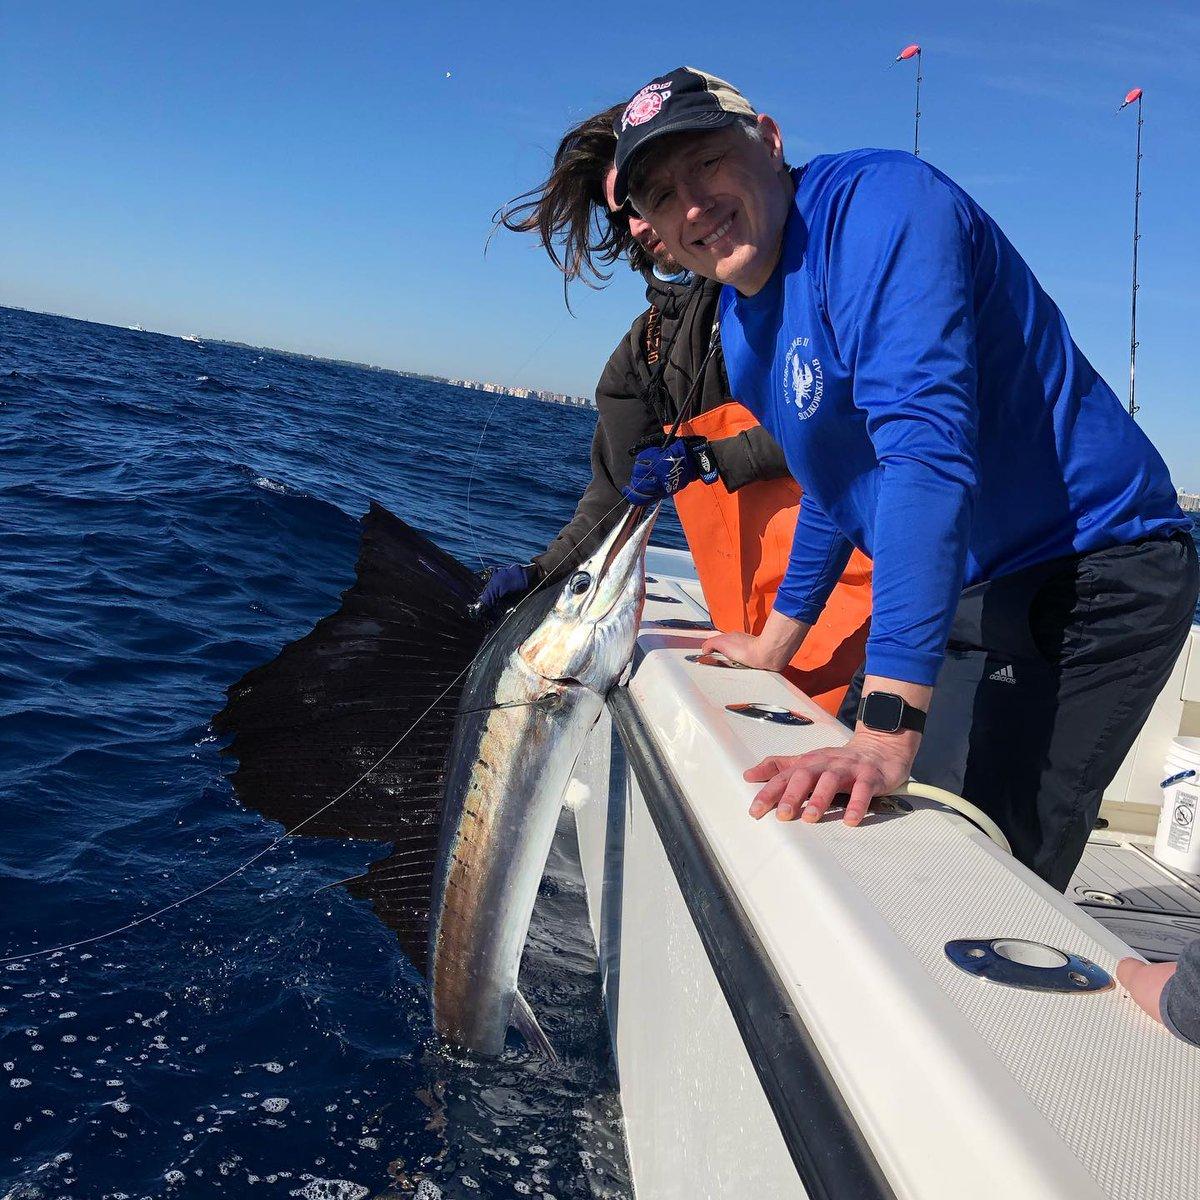 Miami, FL - Double D went 3-4 on Sailfish.